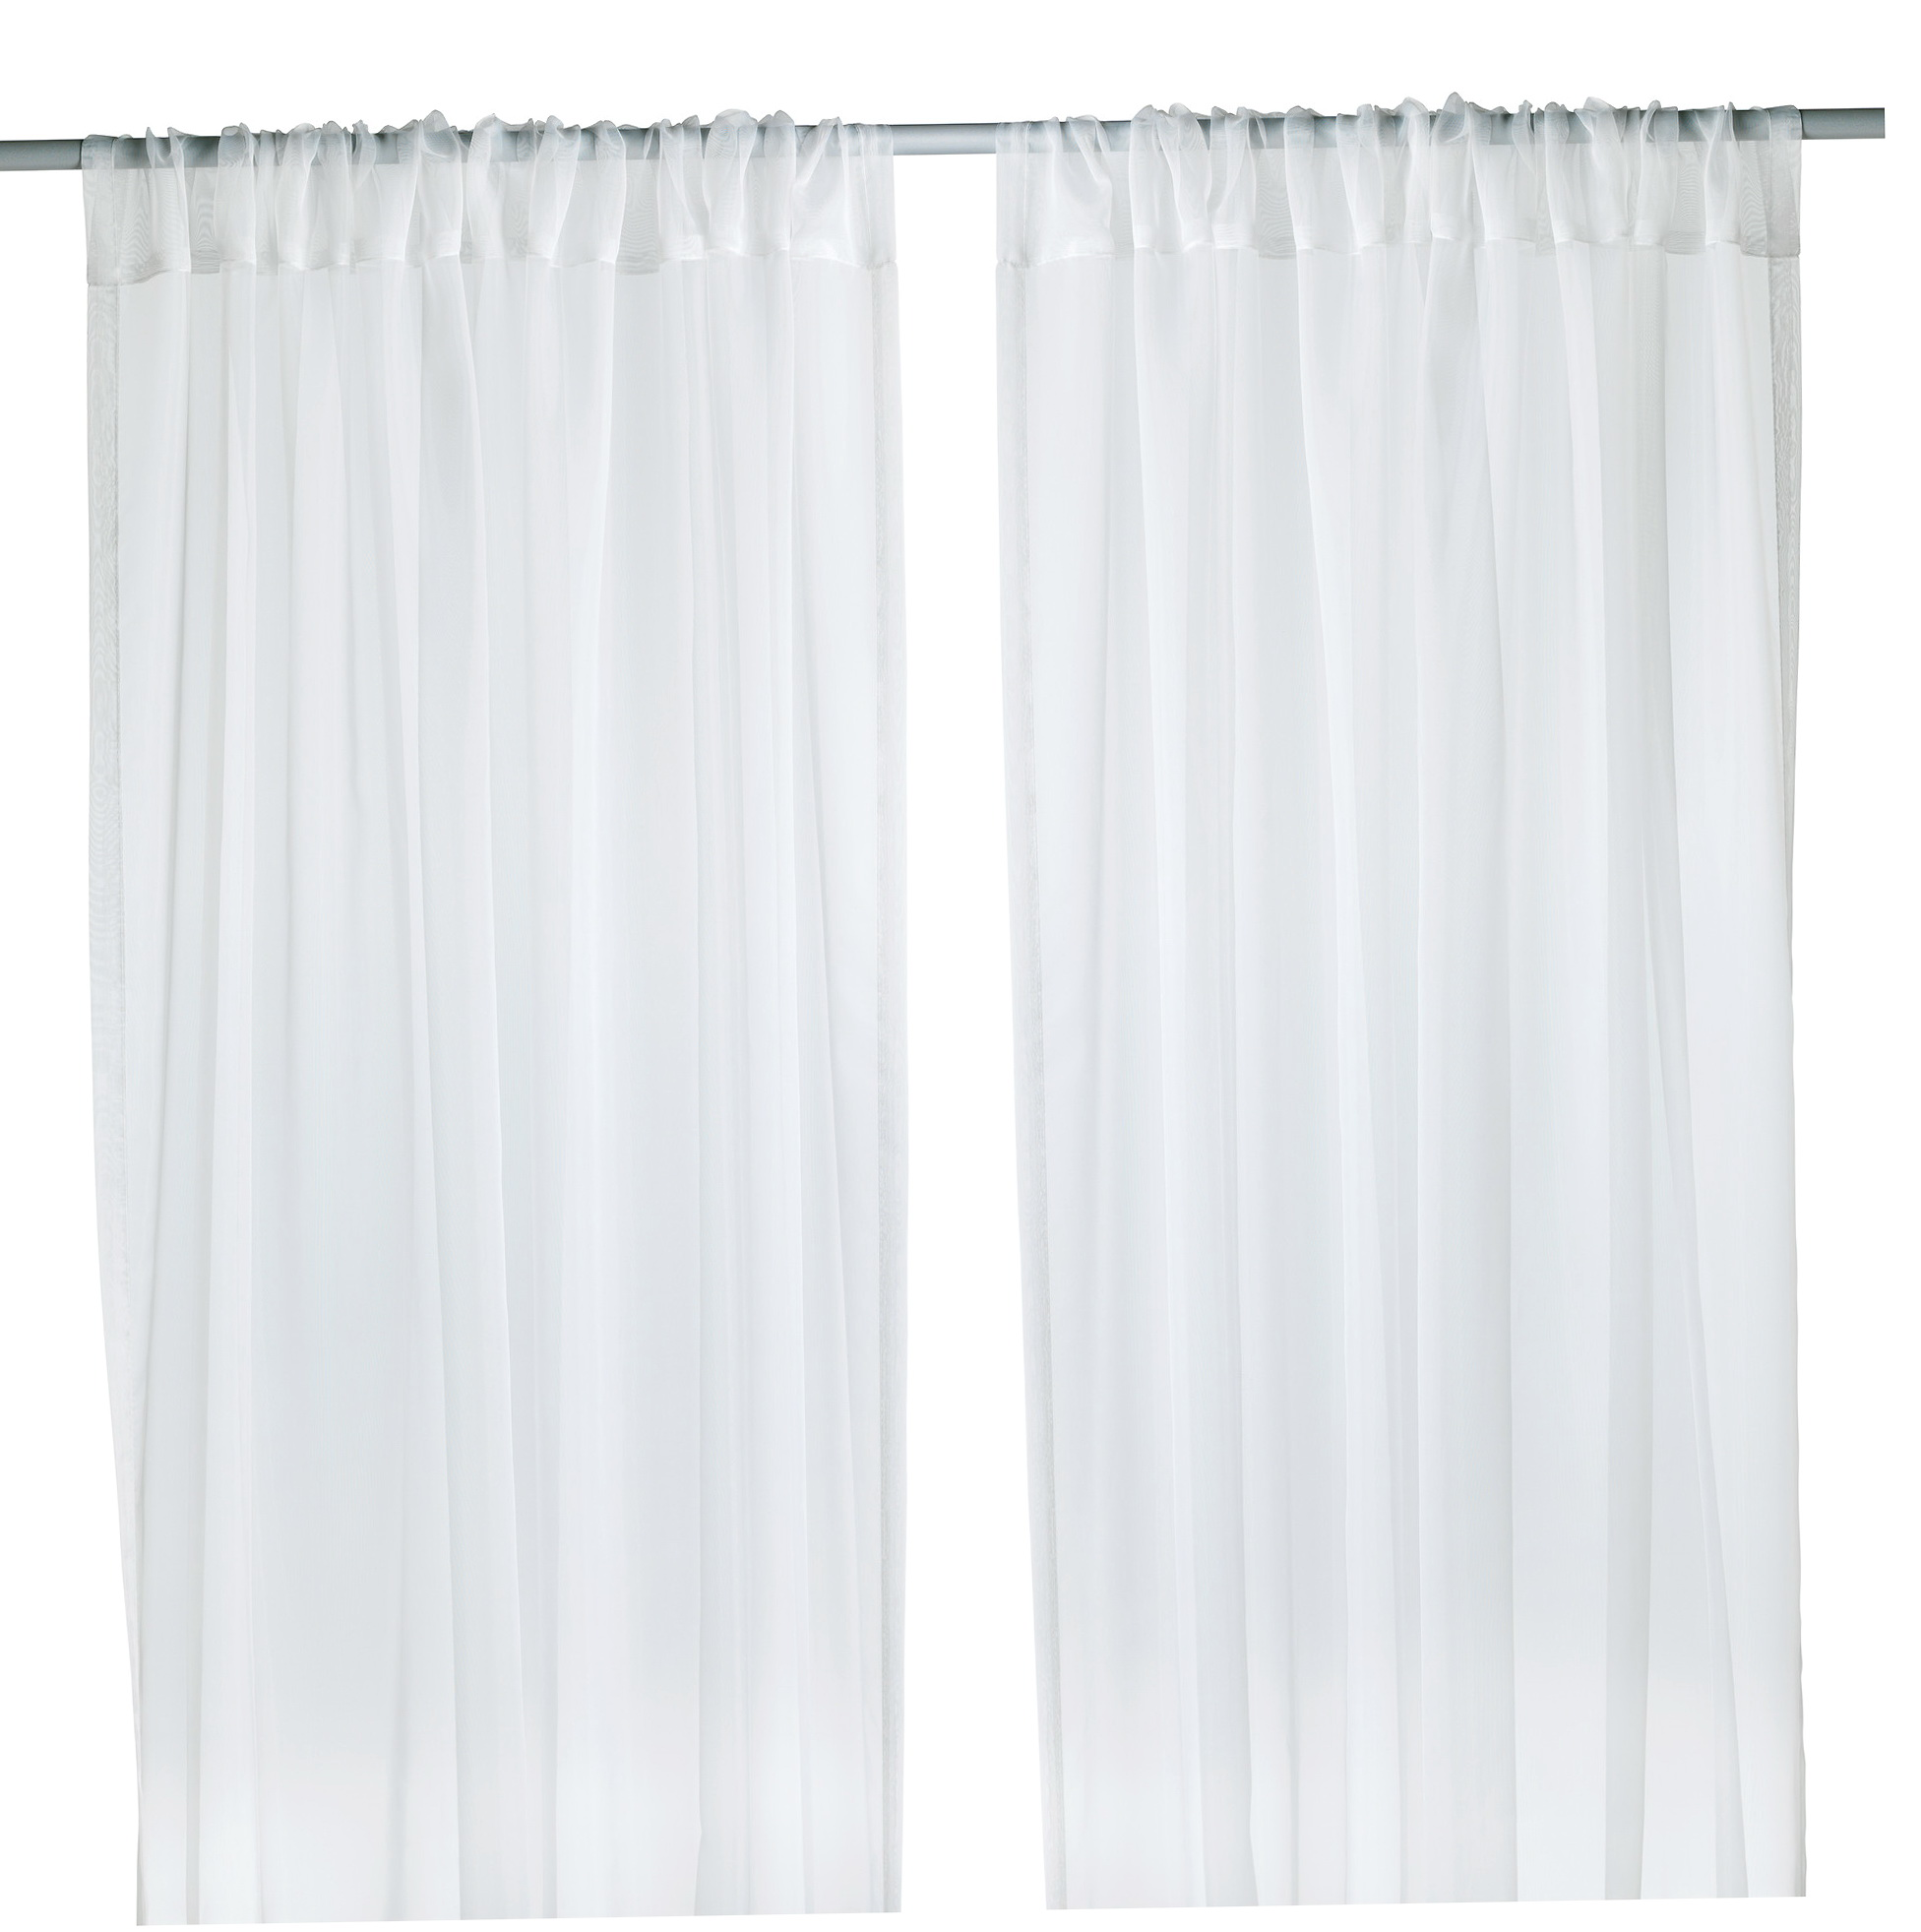 120 Inch Curtains Ikea Home Design Ideas